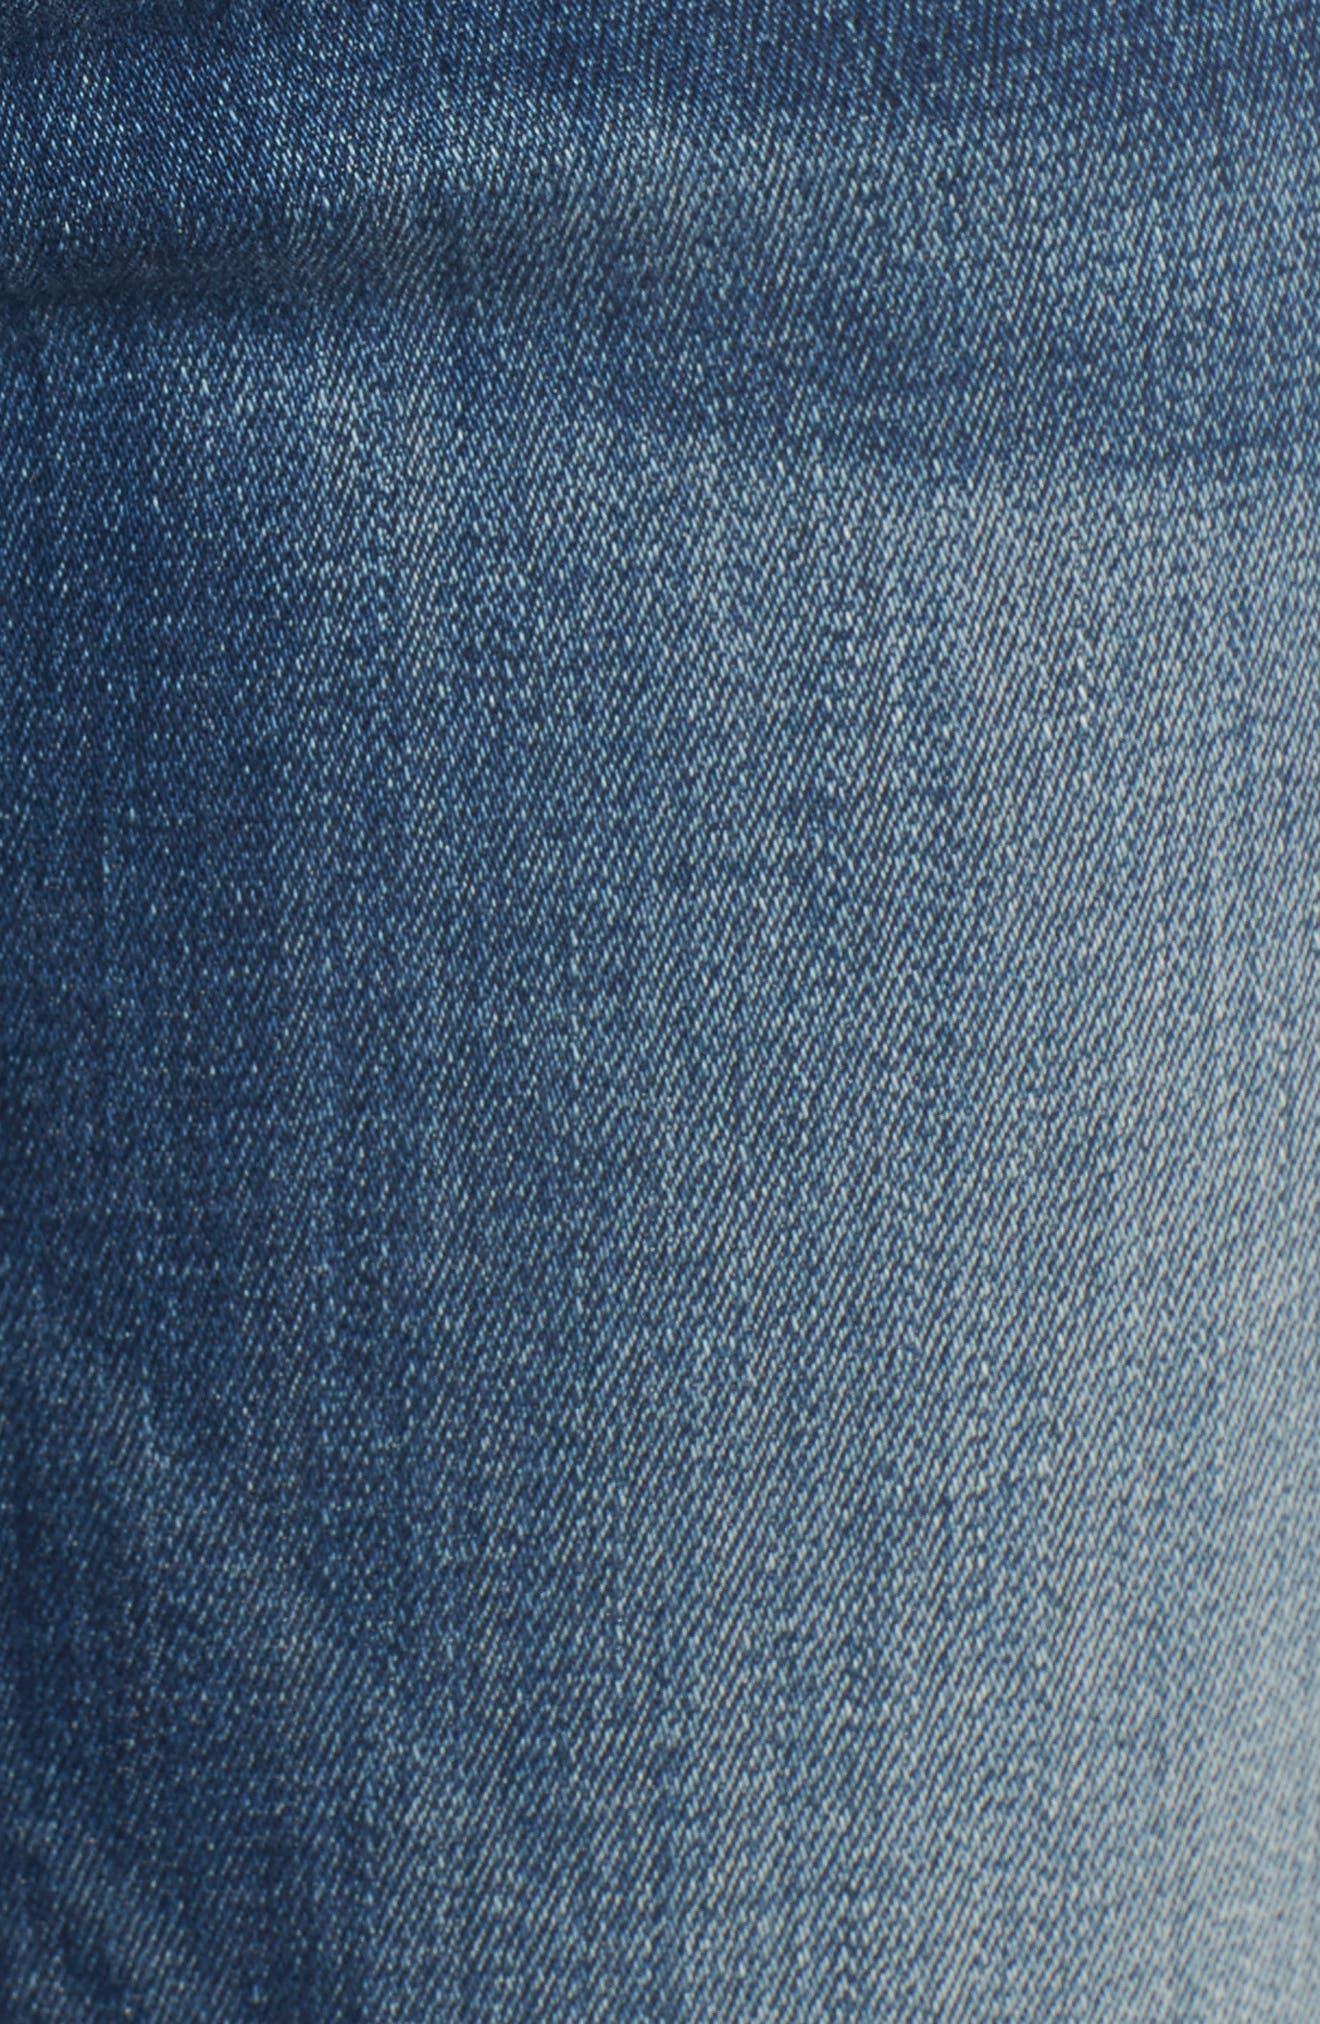 Emma Power Legging Jeans,                             Alternate thumbnail 5, color,                             Westwood